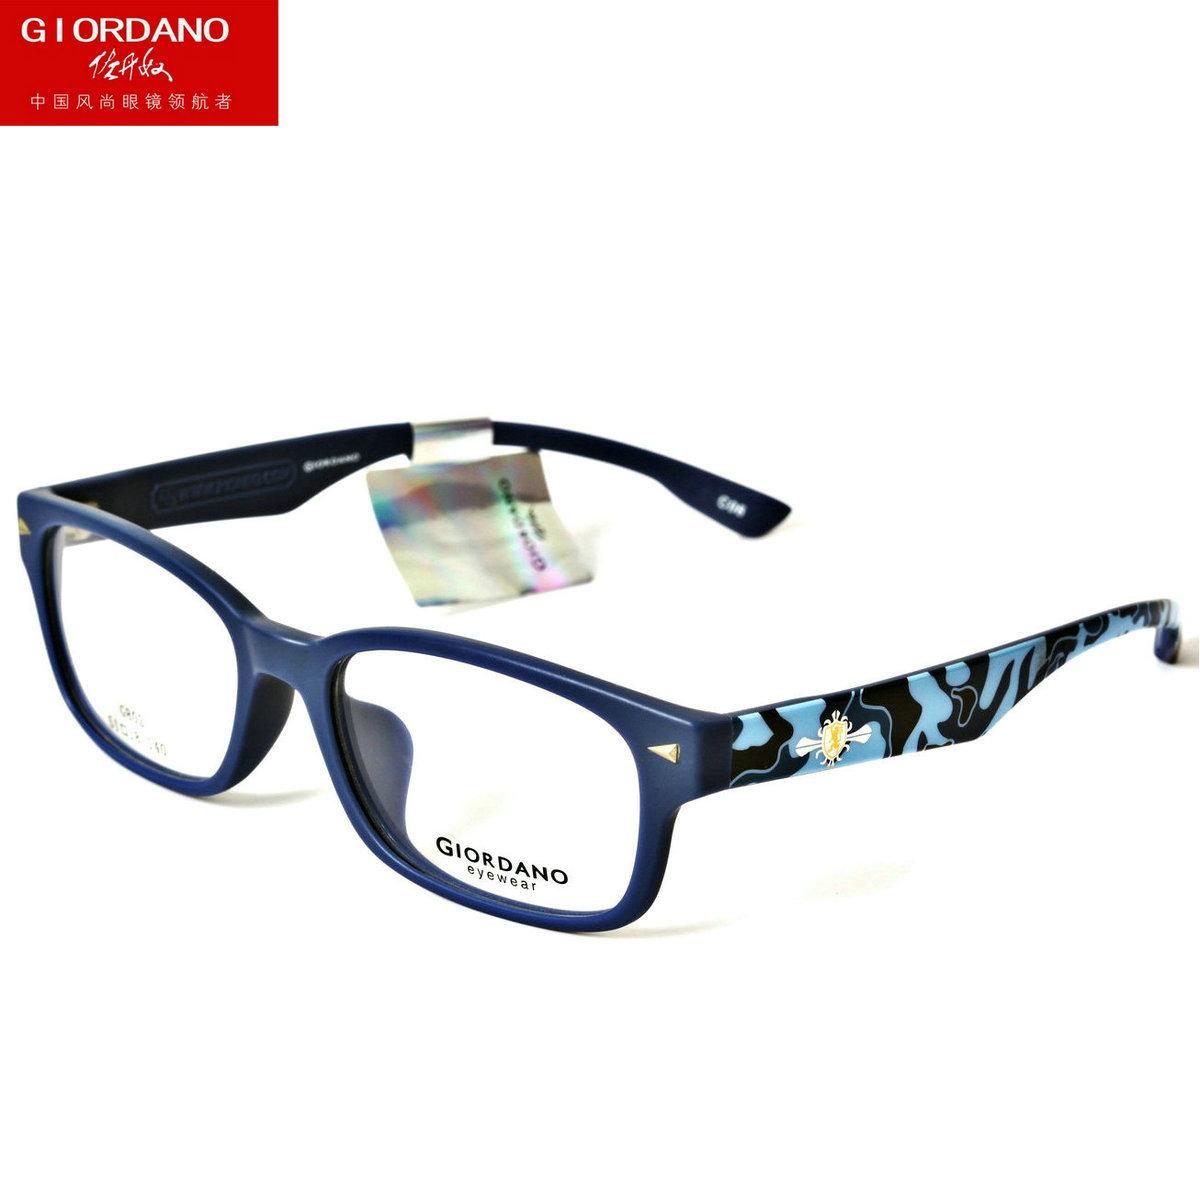 adfa0266c4c9 Buy Giordano glasses lightweight tr90 frame glasses retro sheet myopia  glasses frame plate glasses for men and women in Cheap Price on Alibaba.com